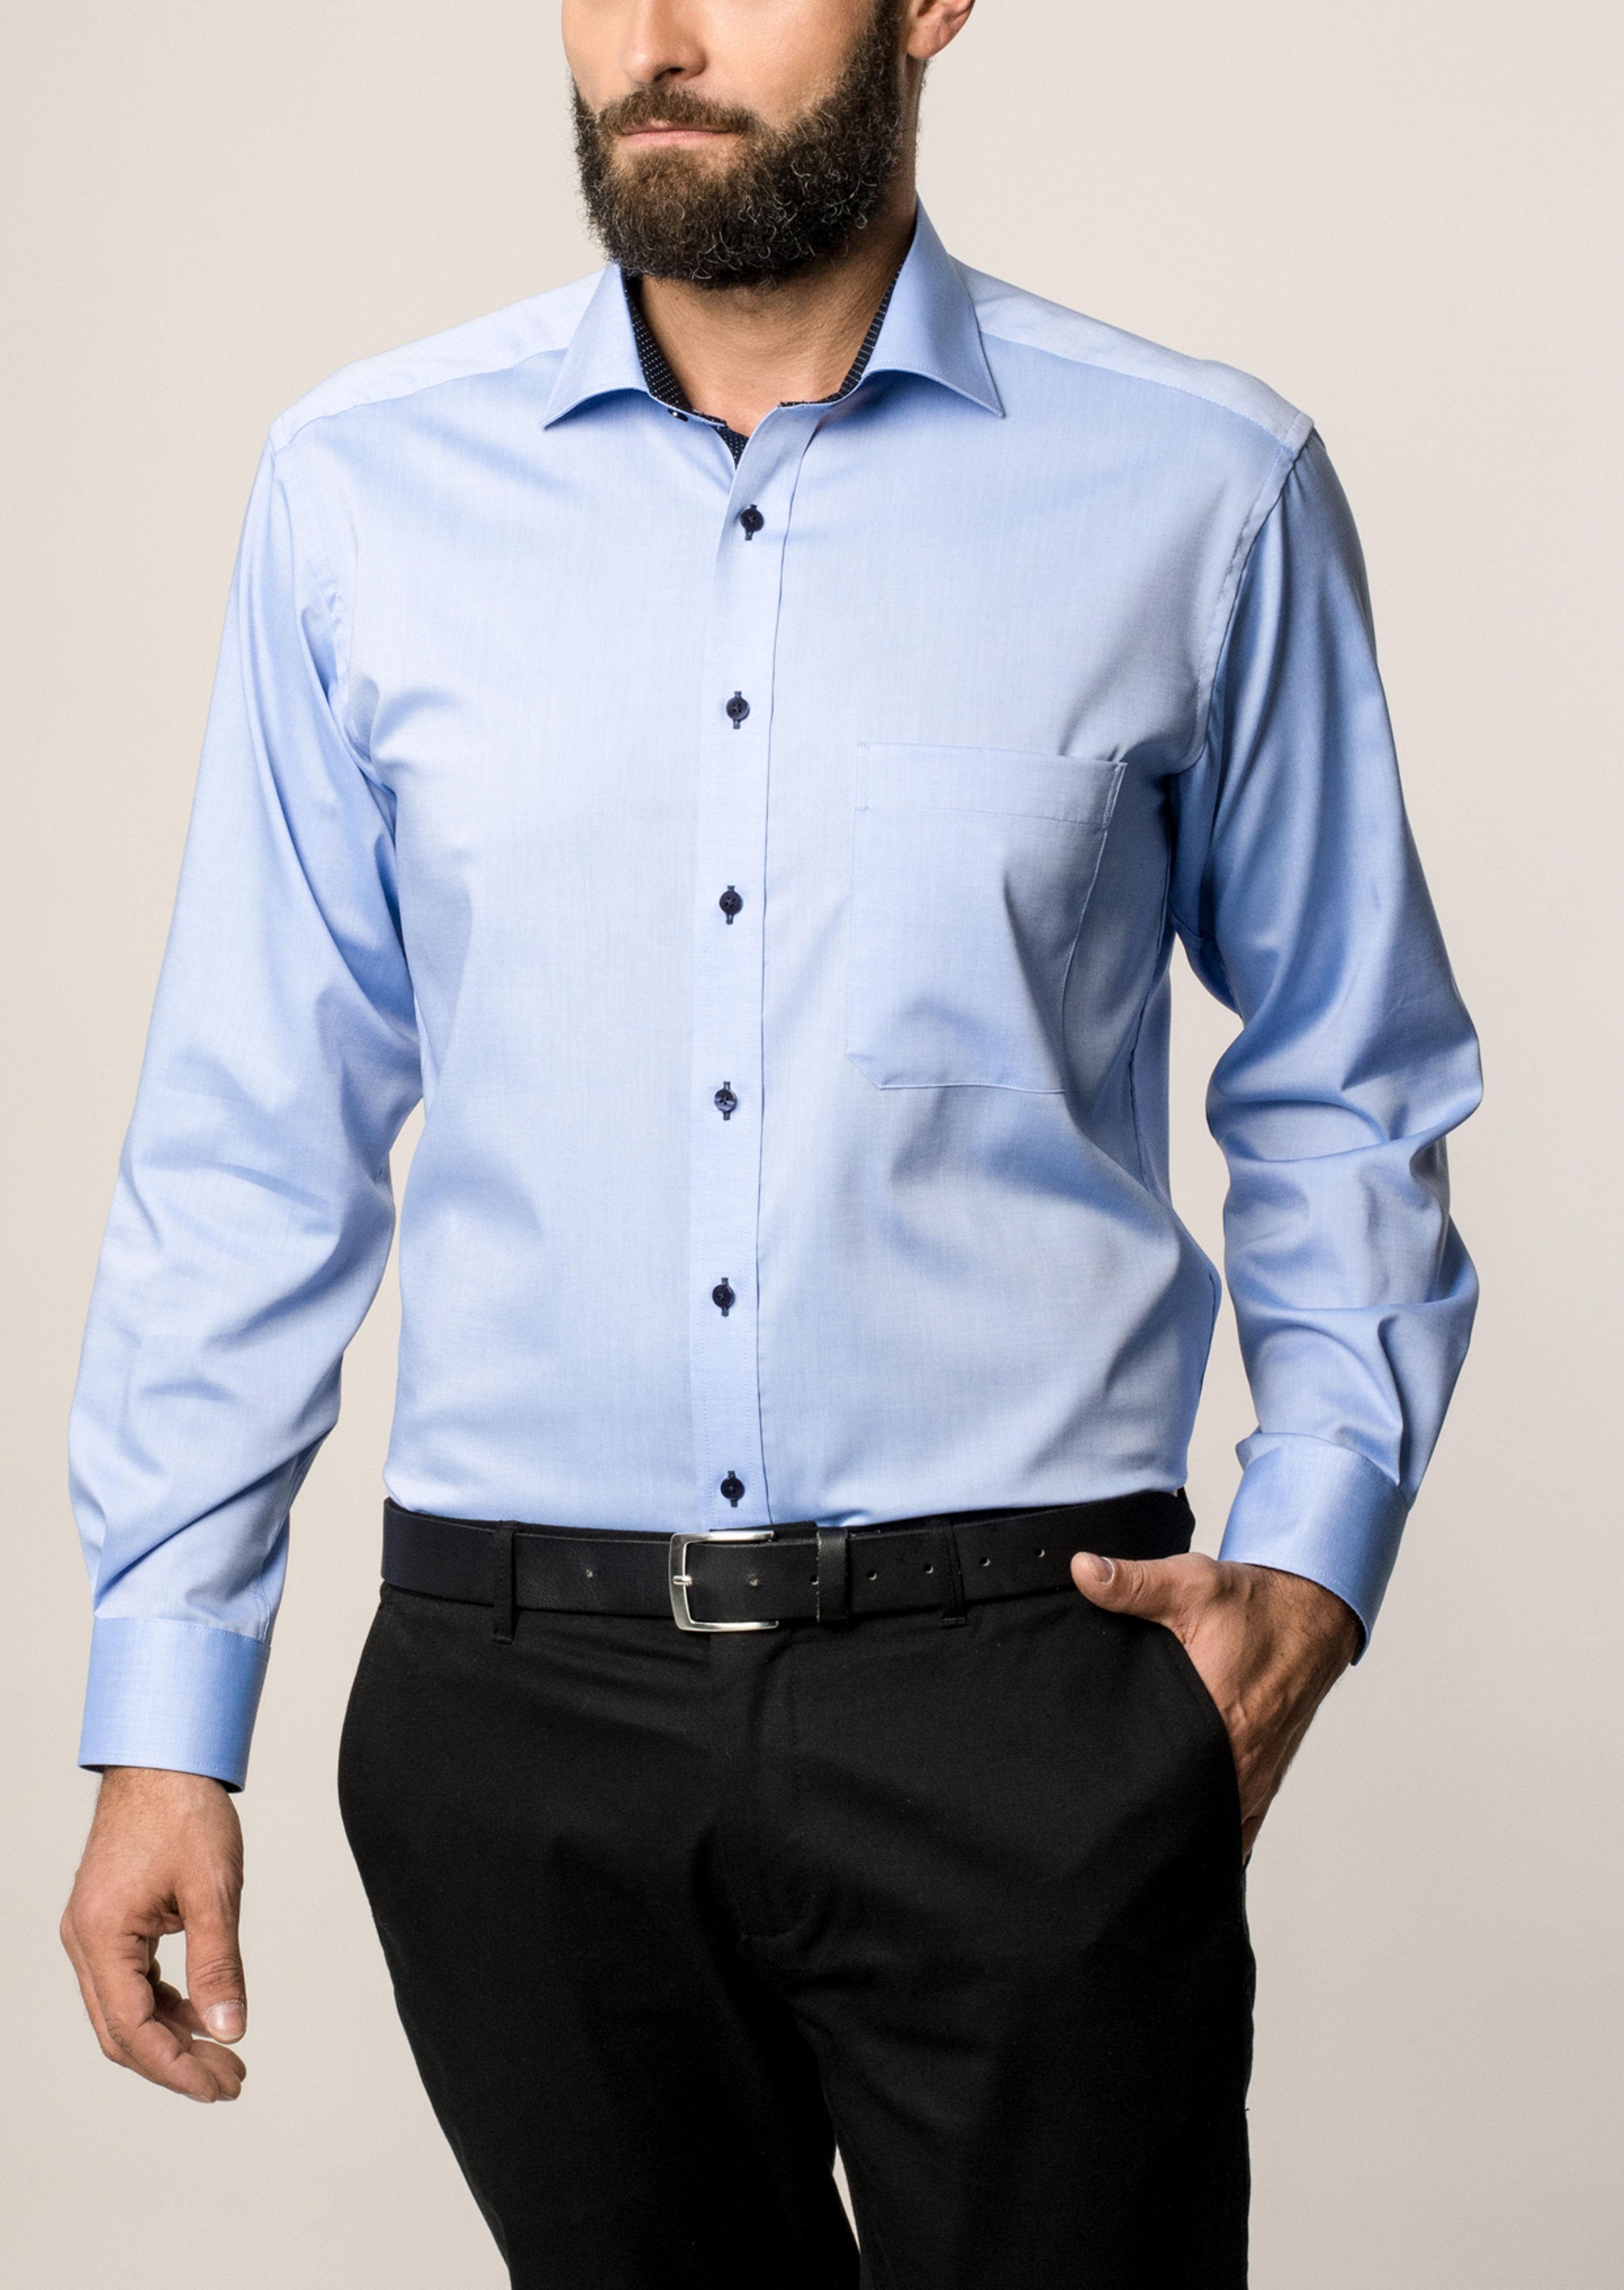 [Lokal / Bundesweit]  P&C:  Eterna Hemden für 29,90€